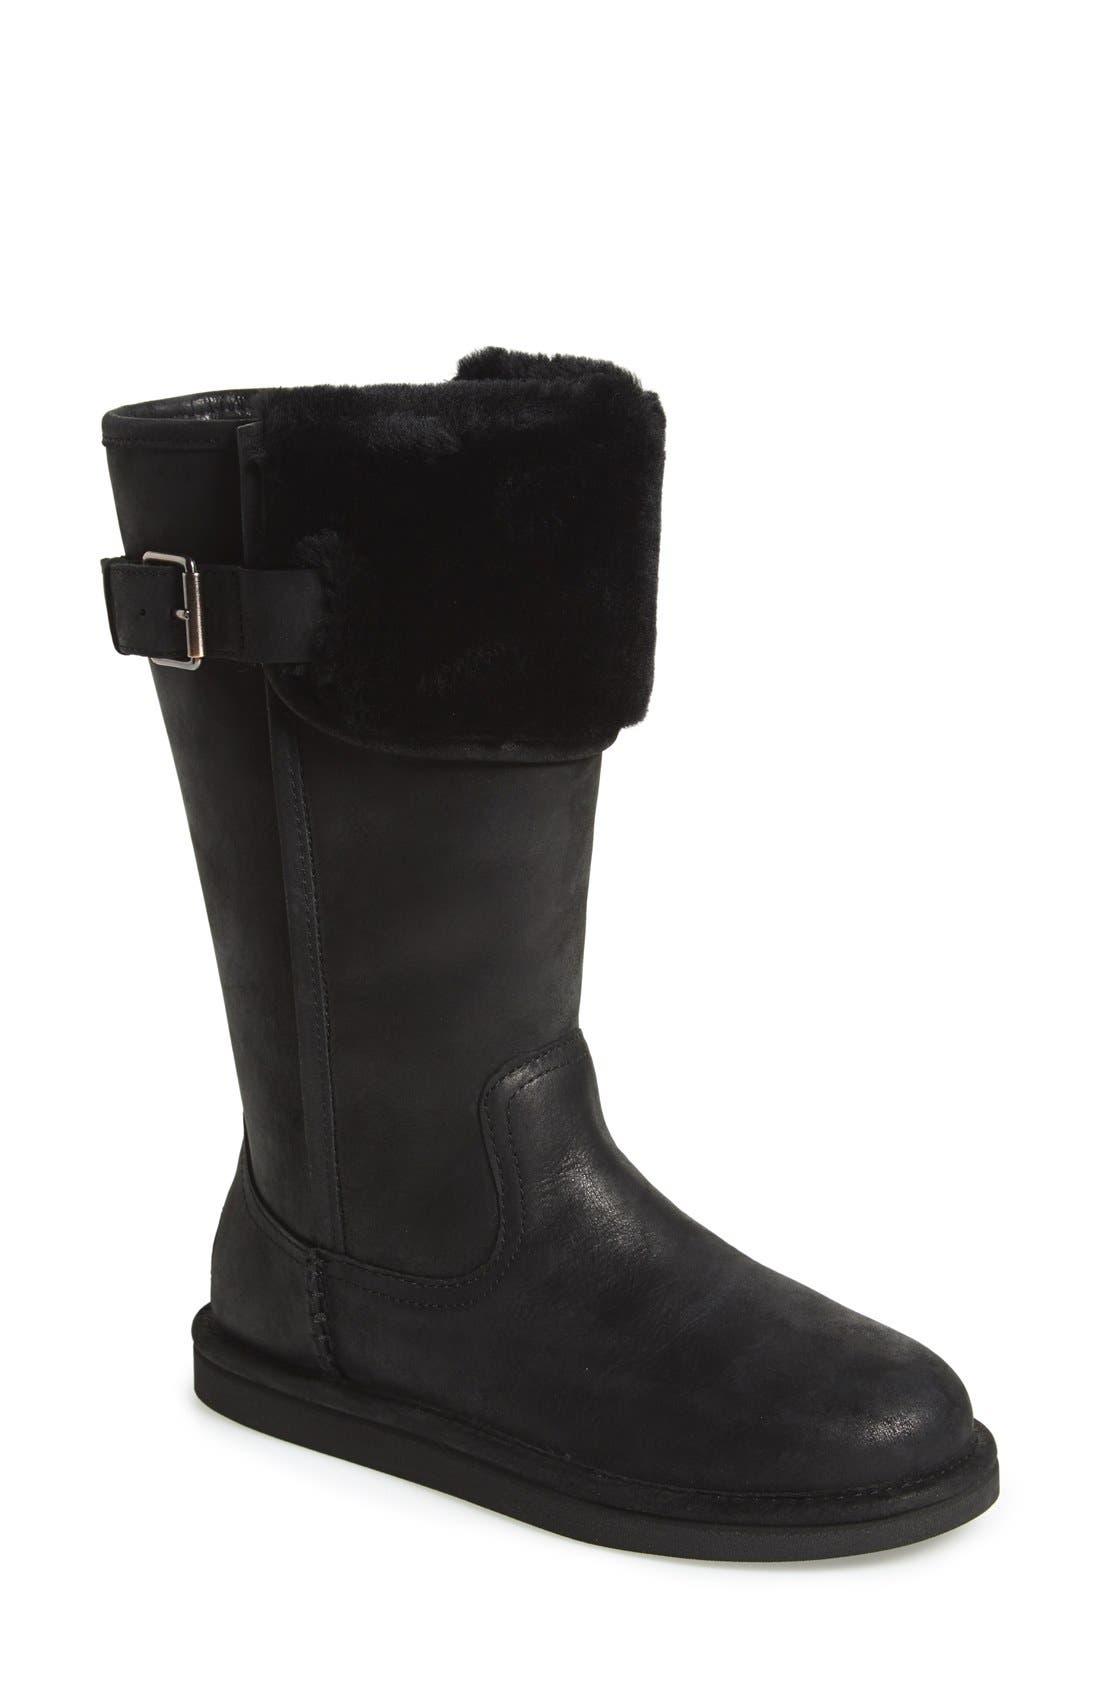 Australia 'Wilowe' Water Resistant Boot, Main, color, 001